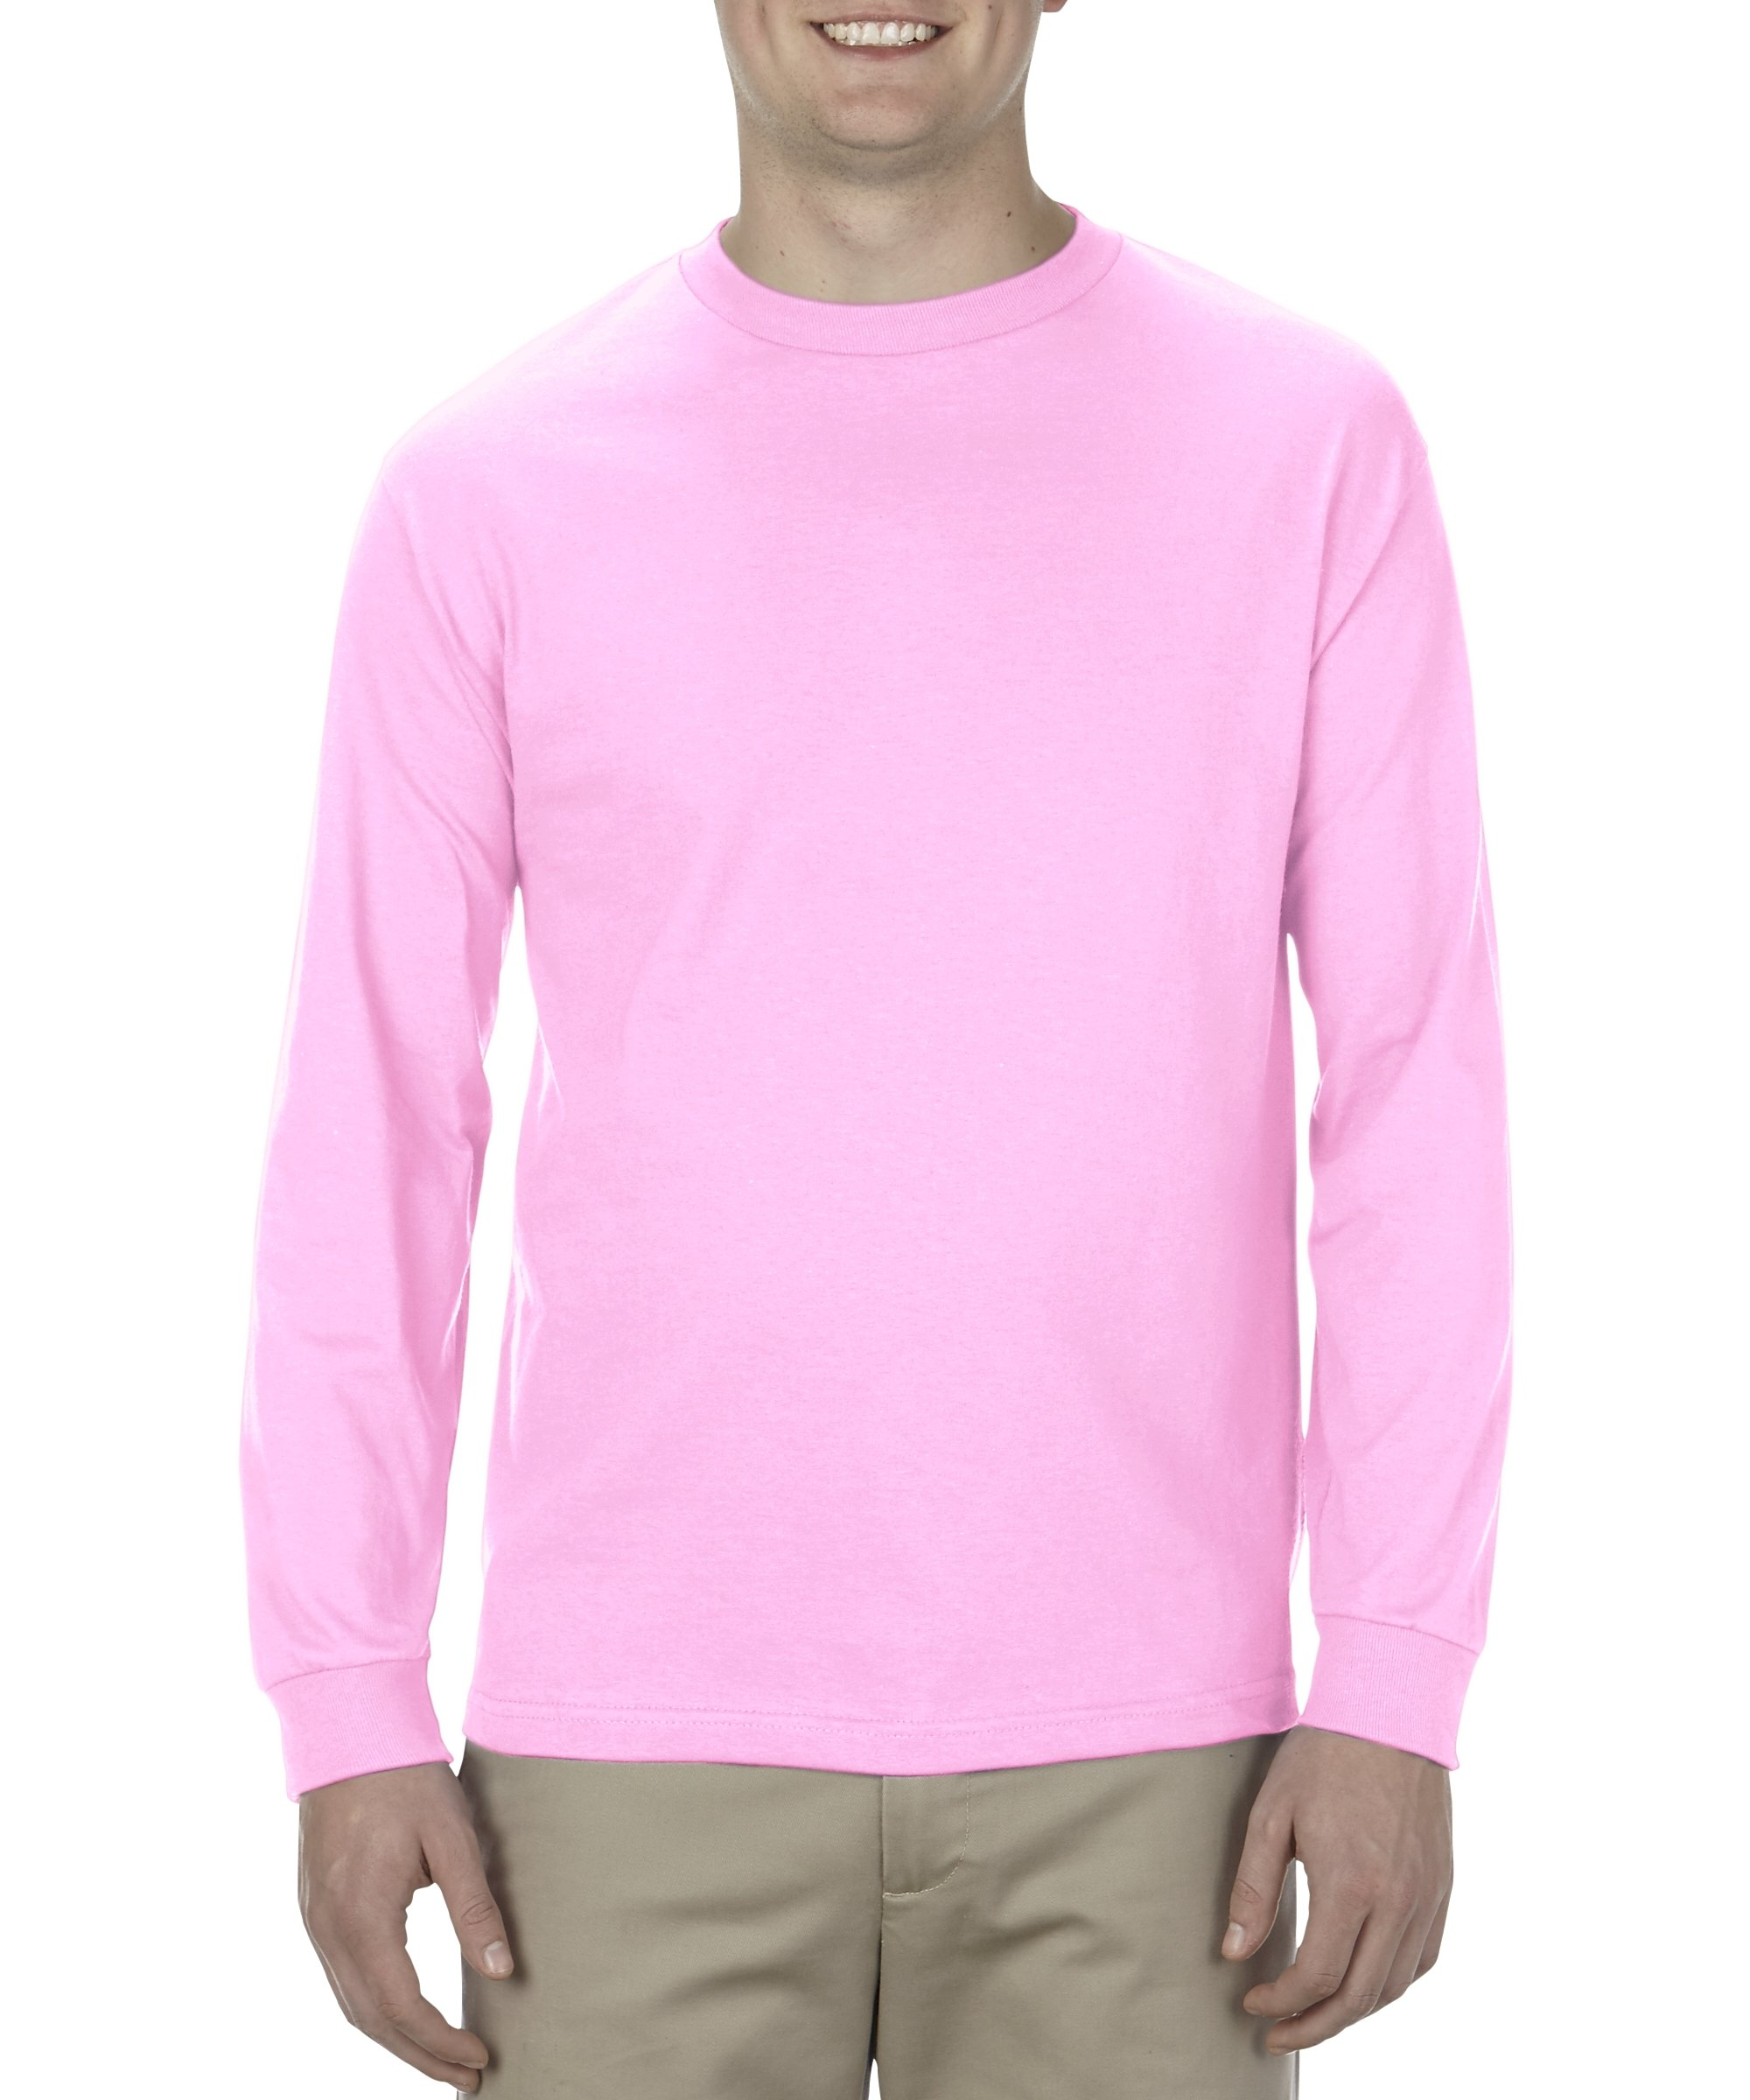 Alstyle Apparel AAA Men's Classic Cotton Long Sleeve T-Shirt, Pink, 2XL